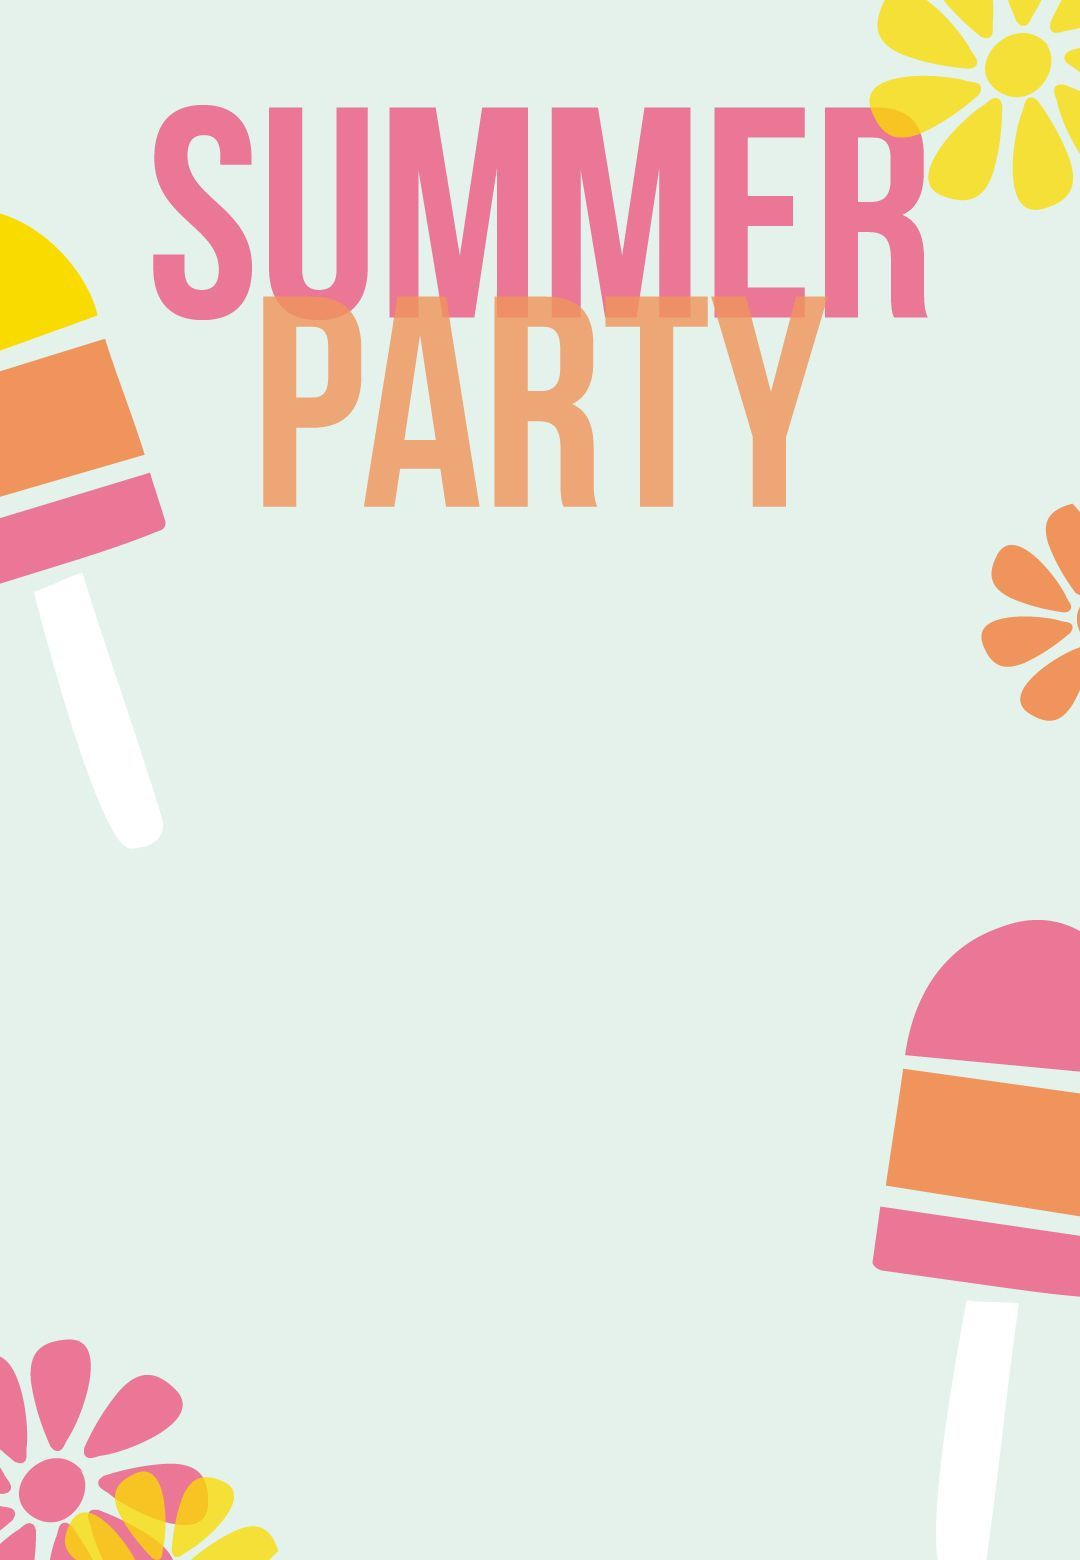 007 Fearsome Pool Party Invitation Template Free Idea  Downloadable Printable SwimmingFull